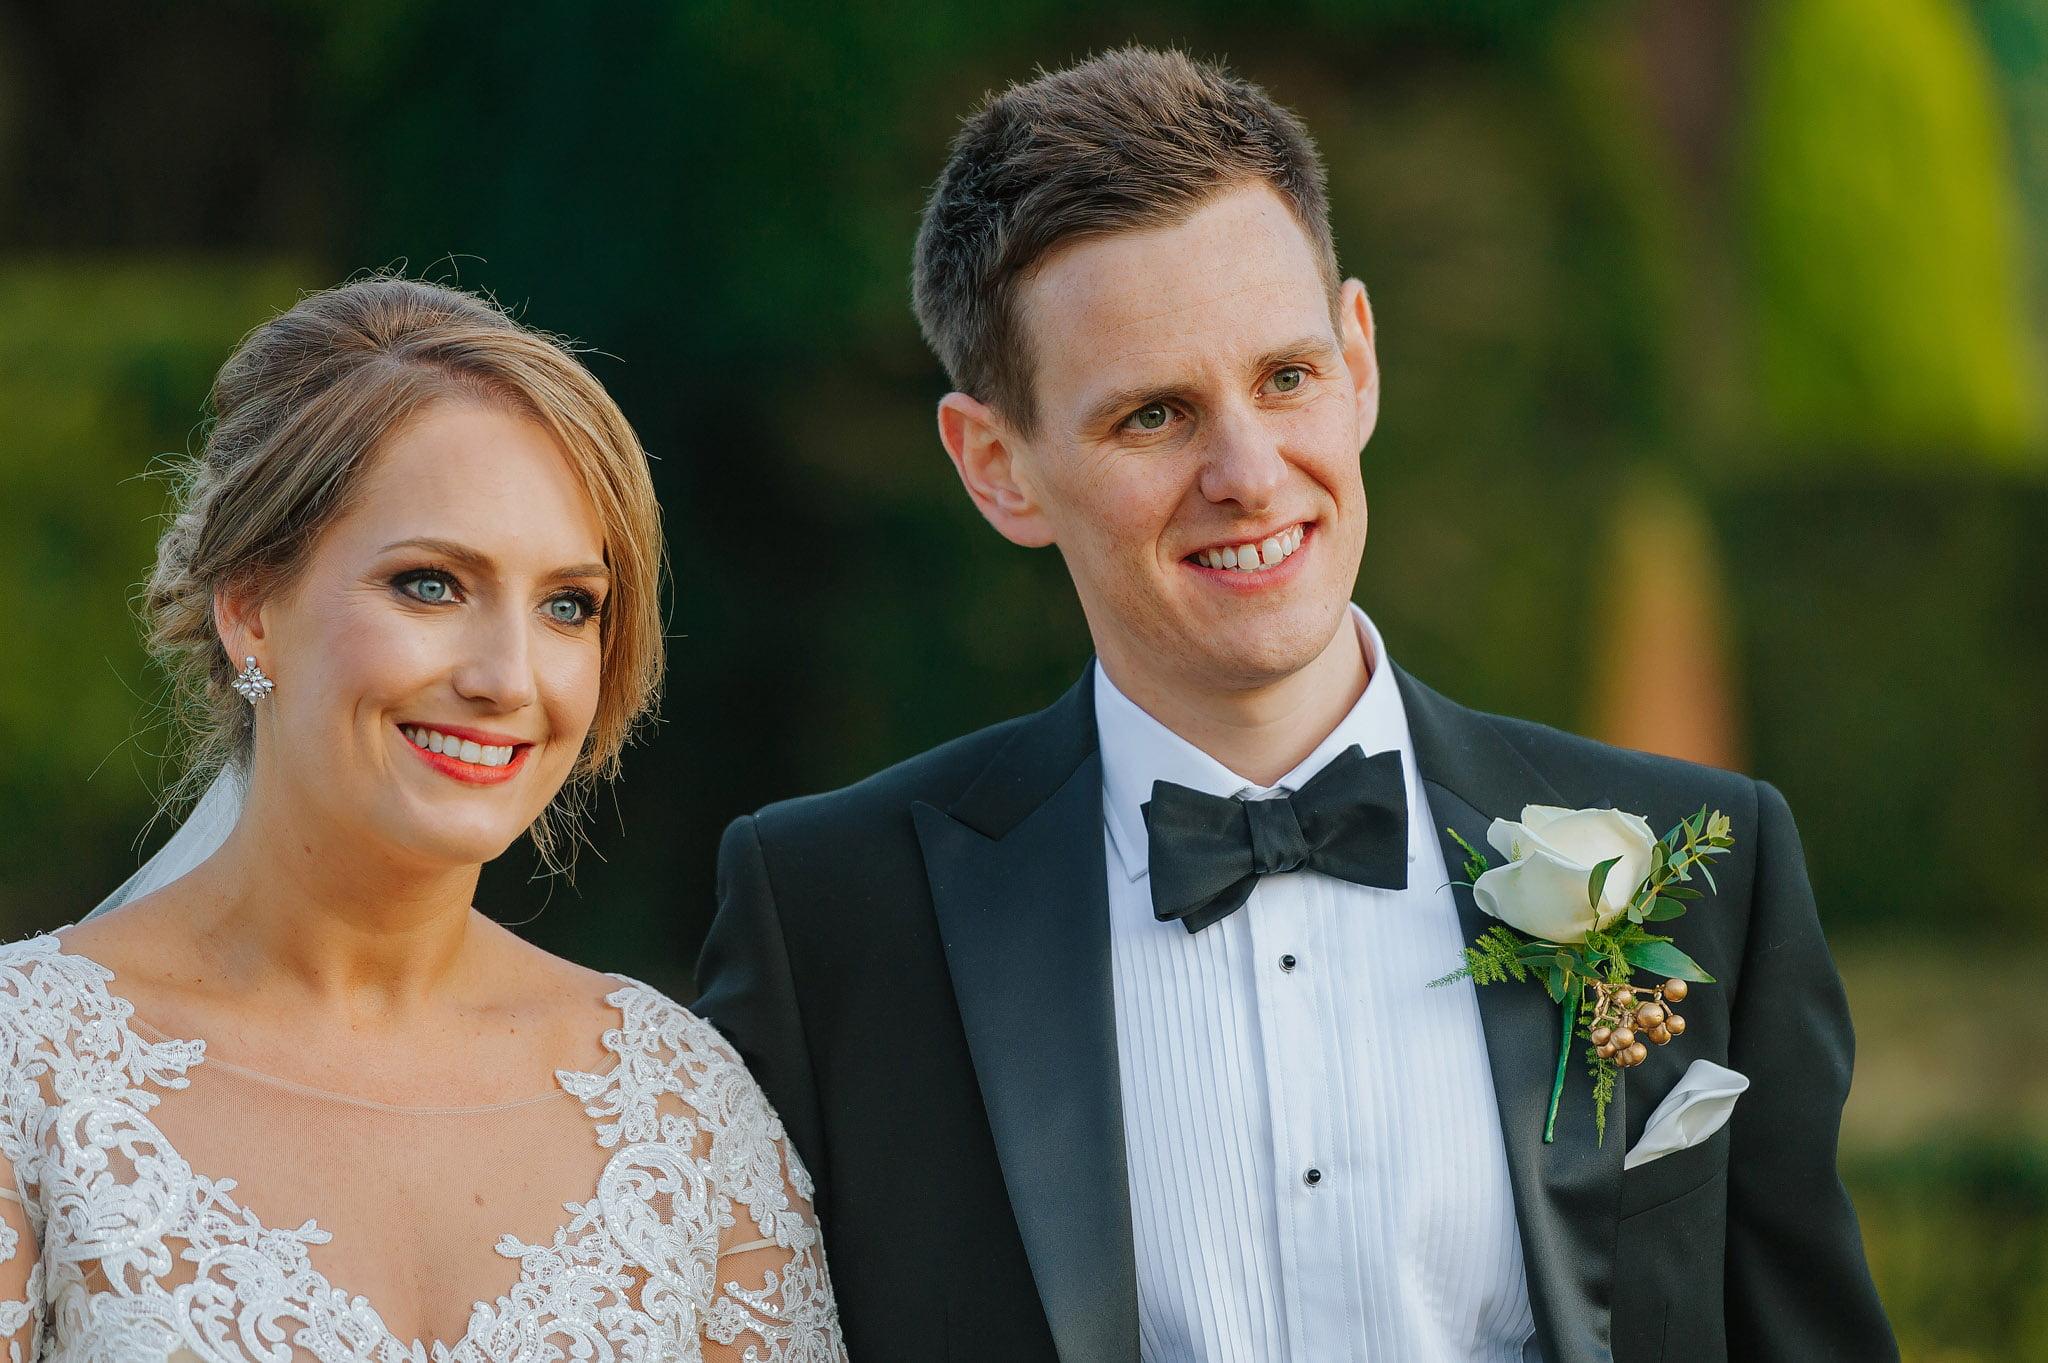 Coombe Abbey wedding in Coventry, Warwickshire - Sam + Matt 39